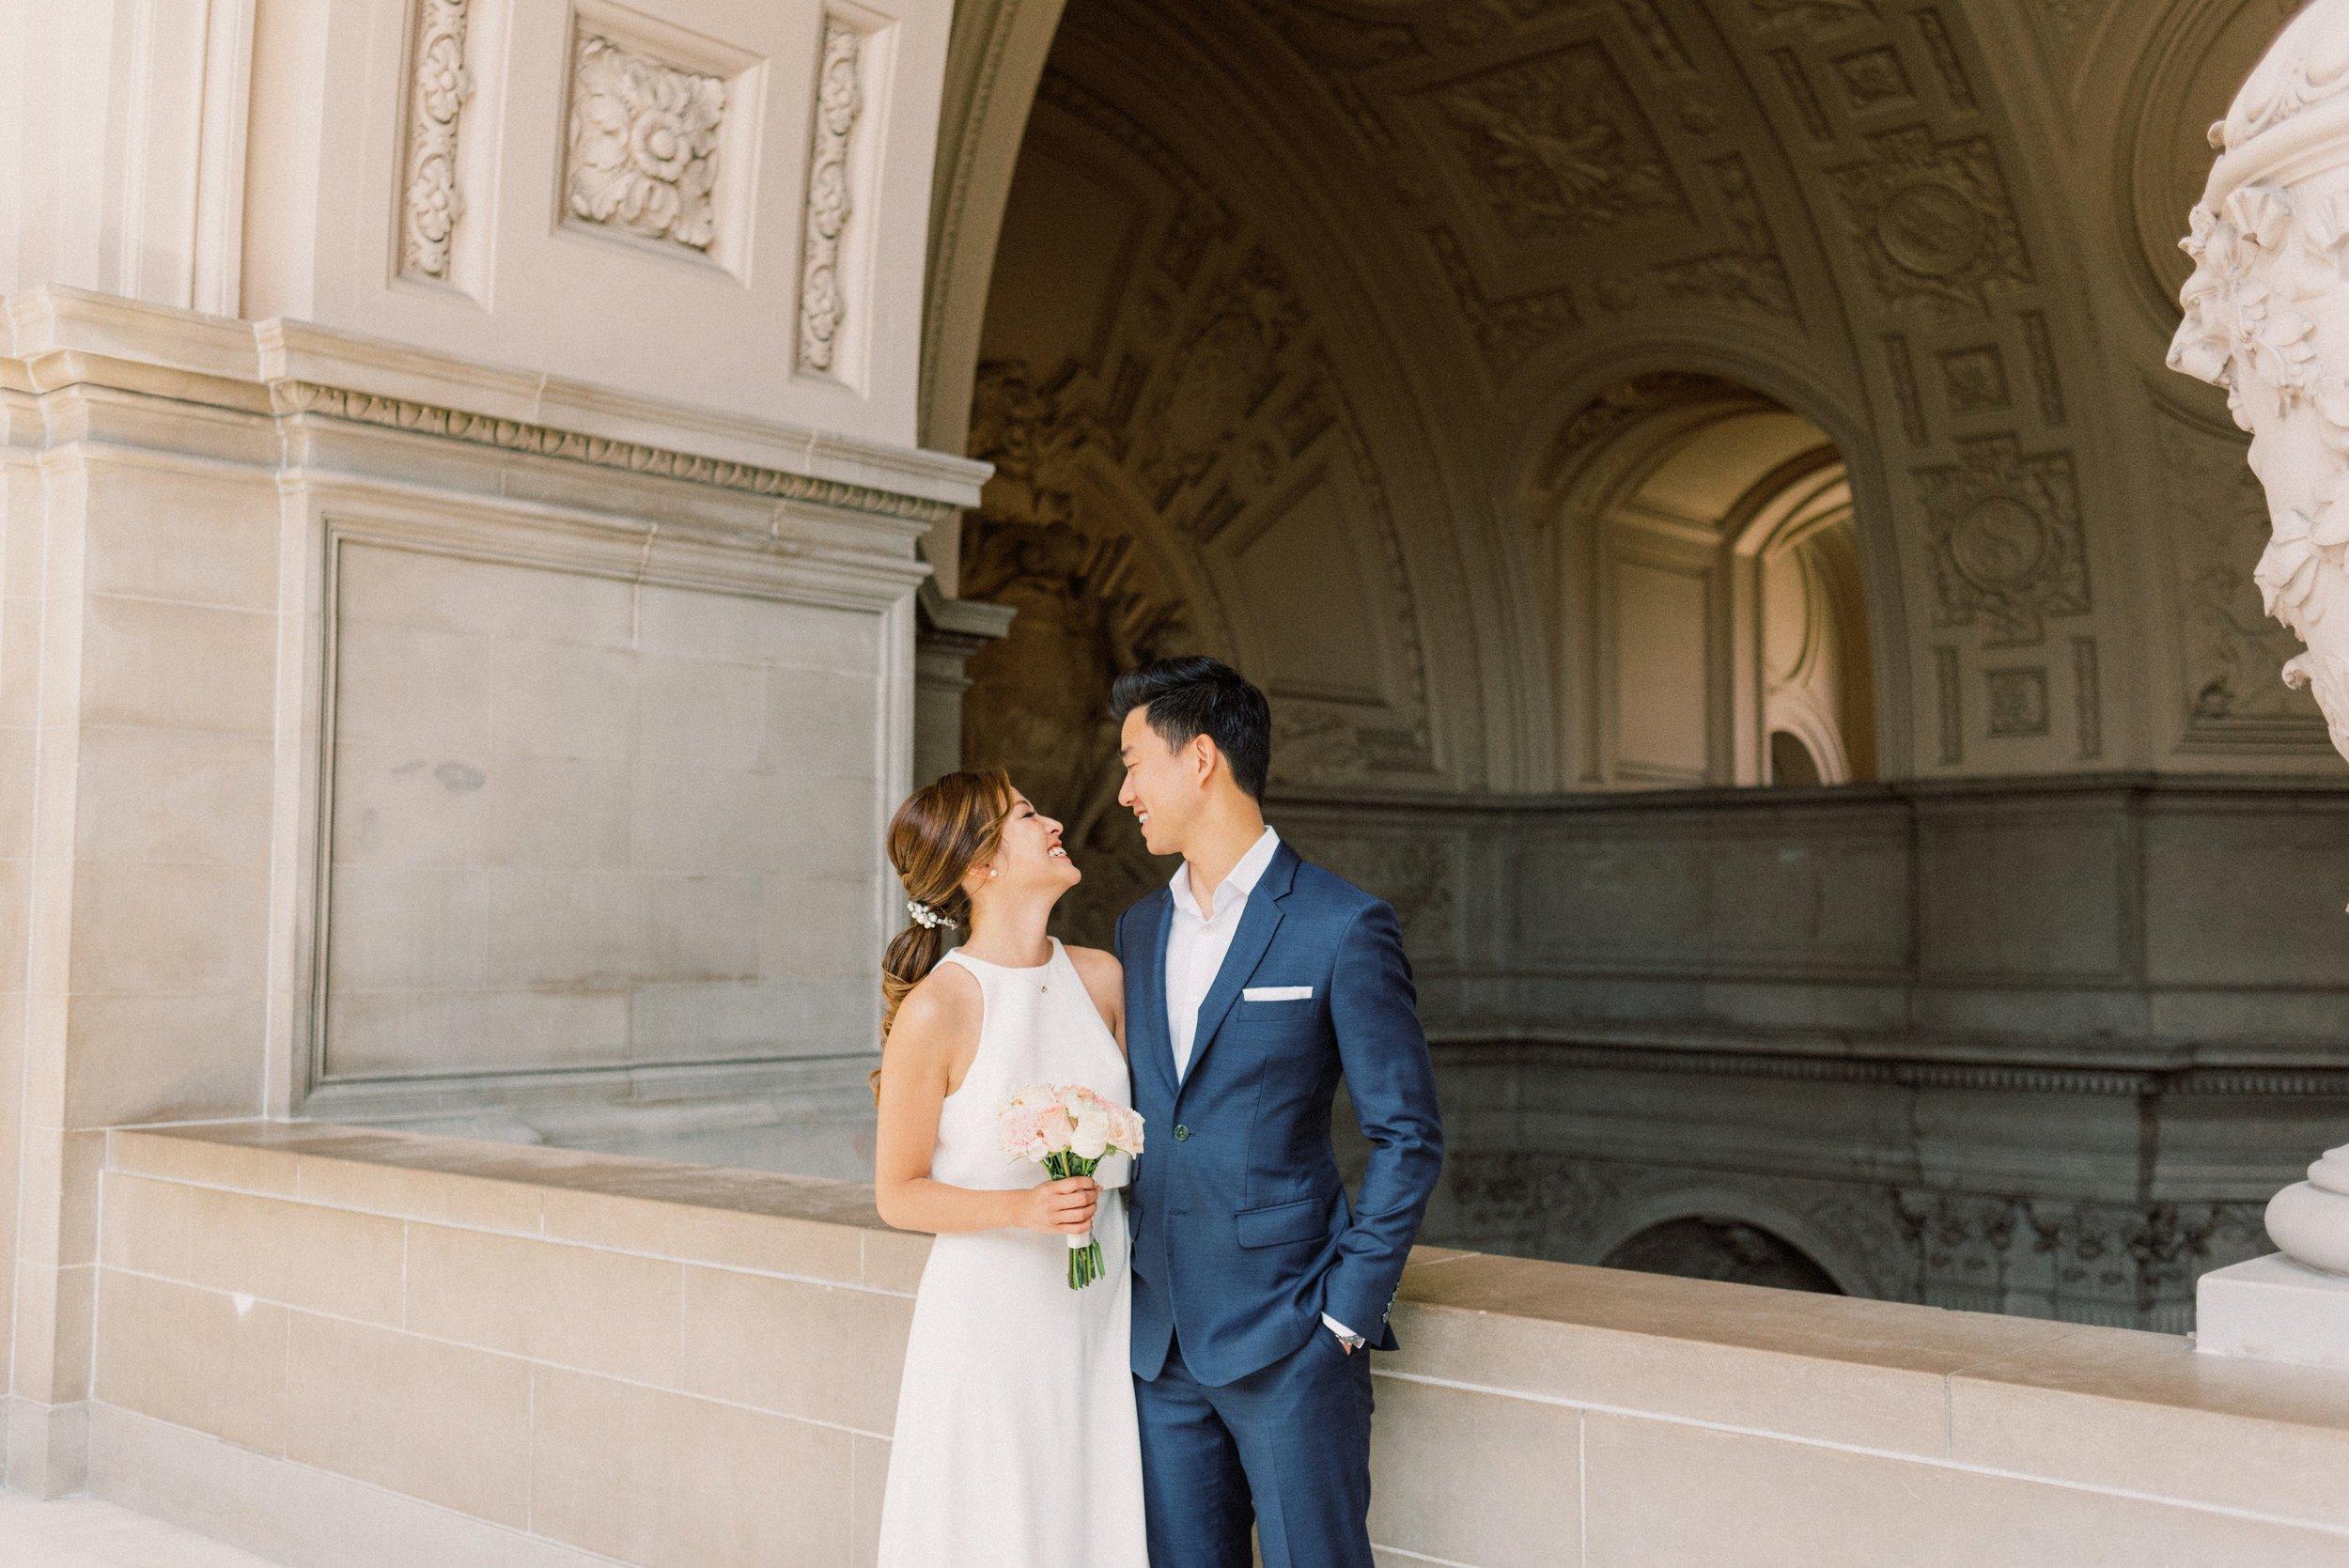 San-francisco-city-hall-photography-wedding-012.jpg